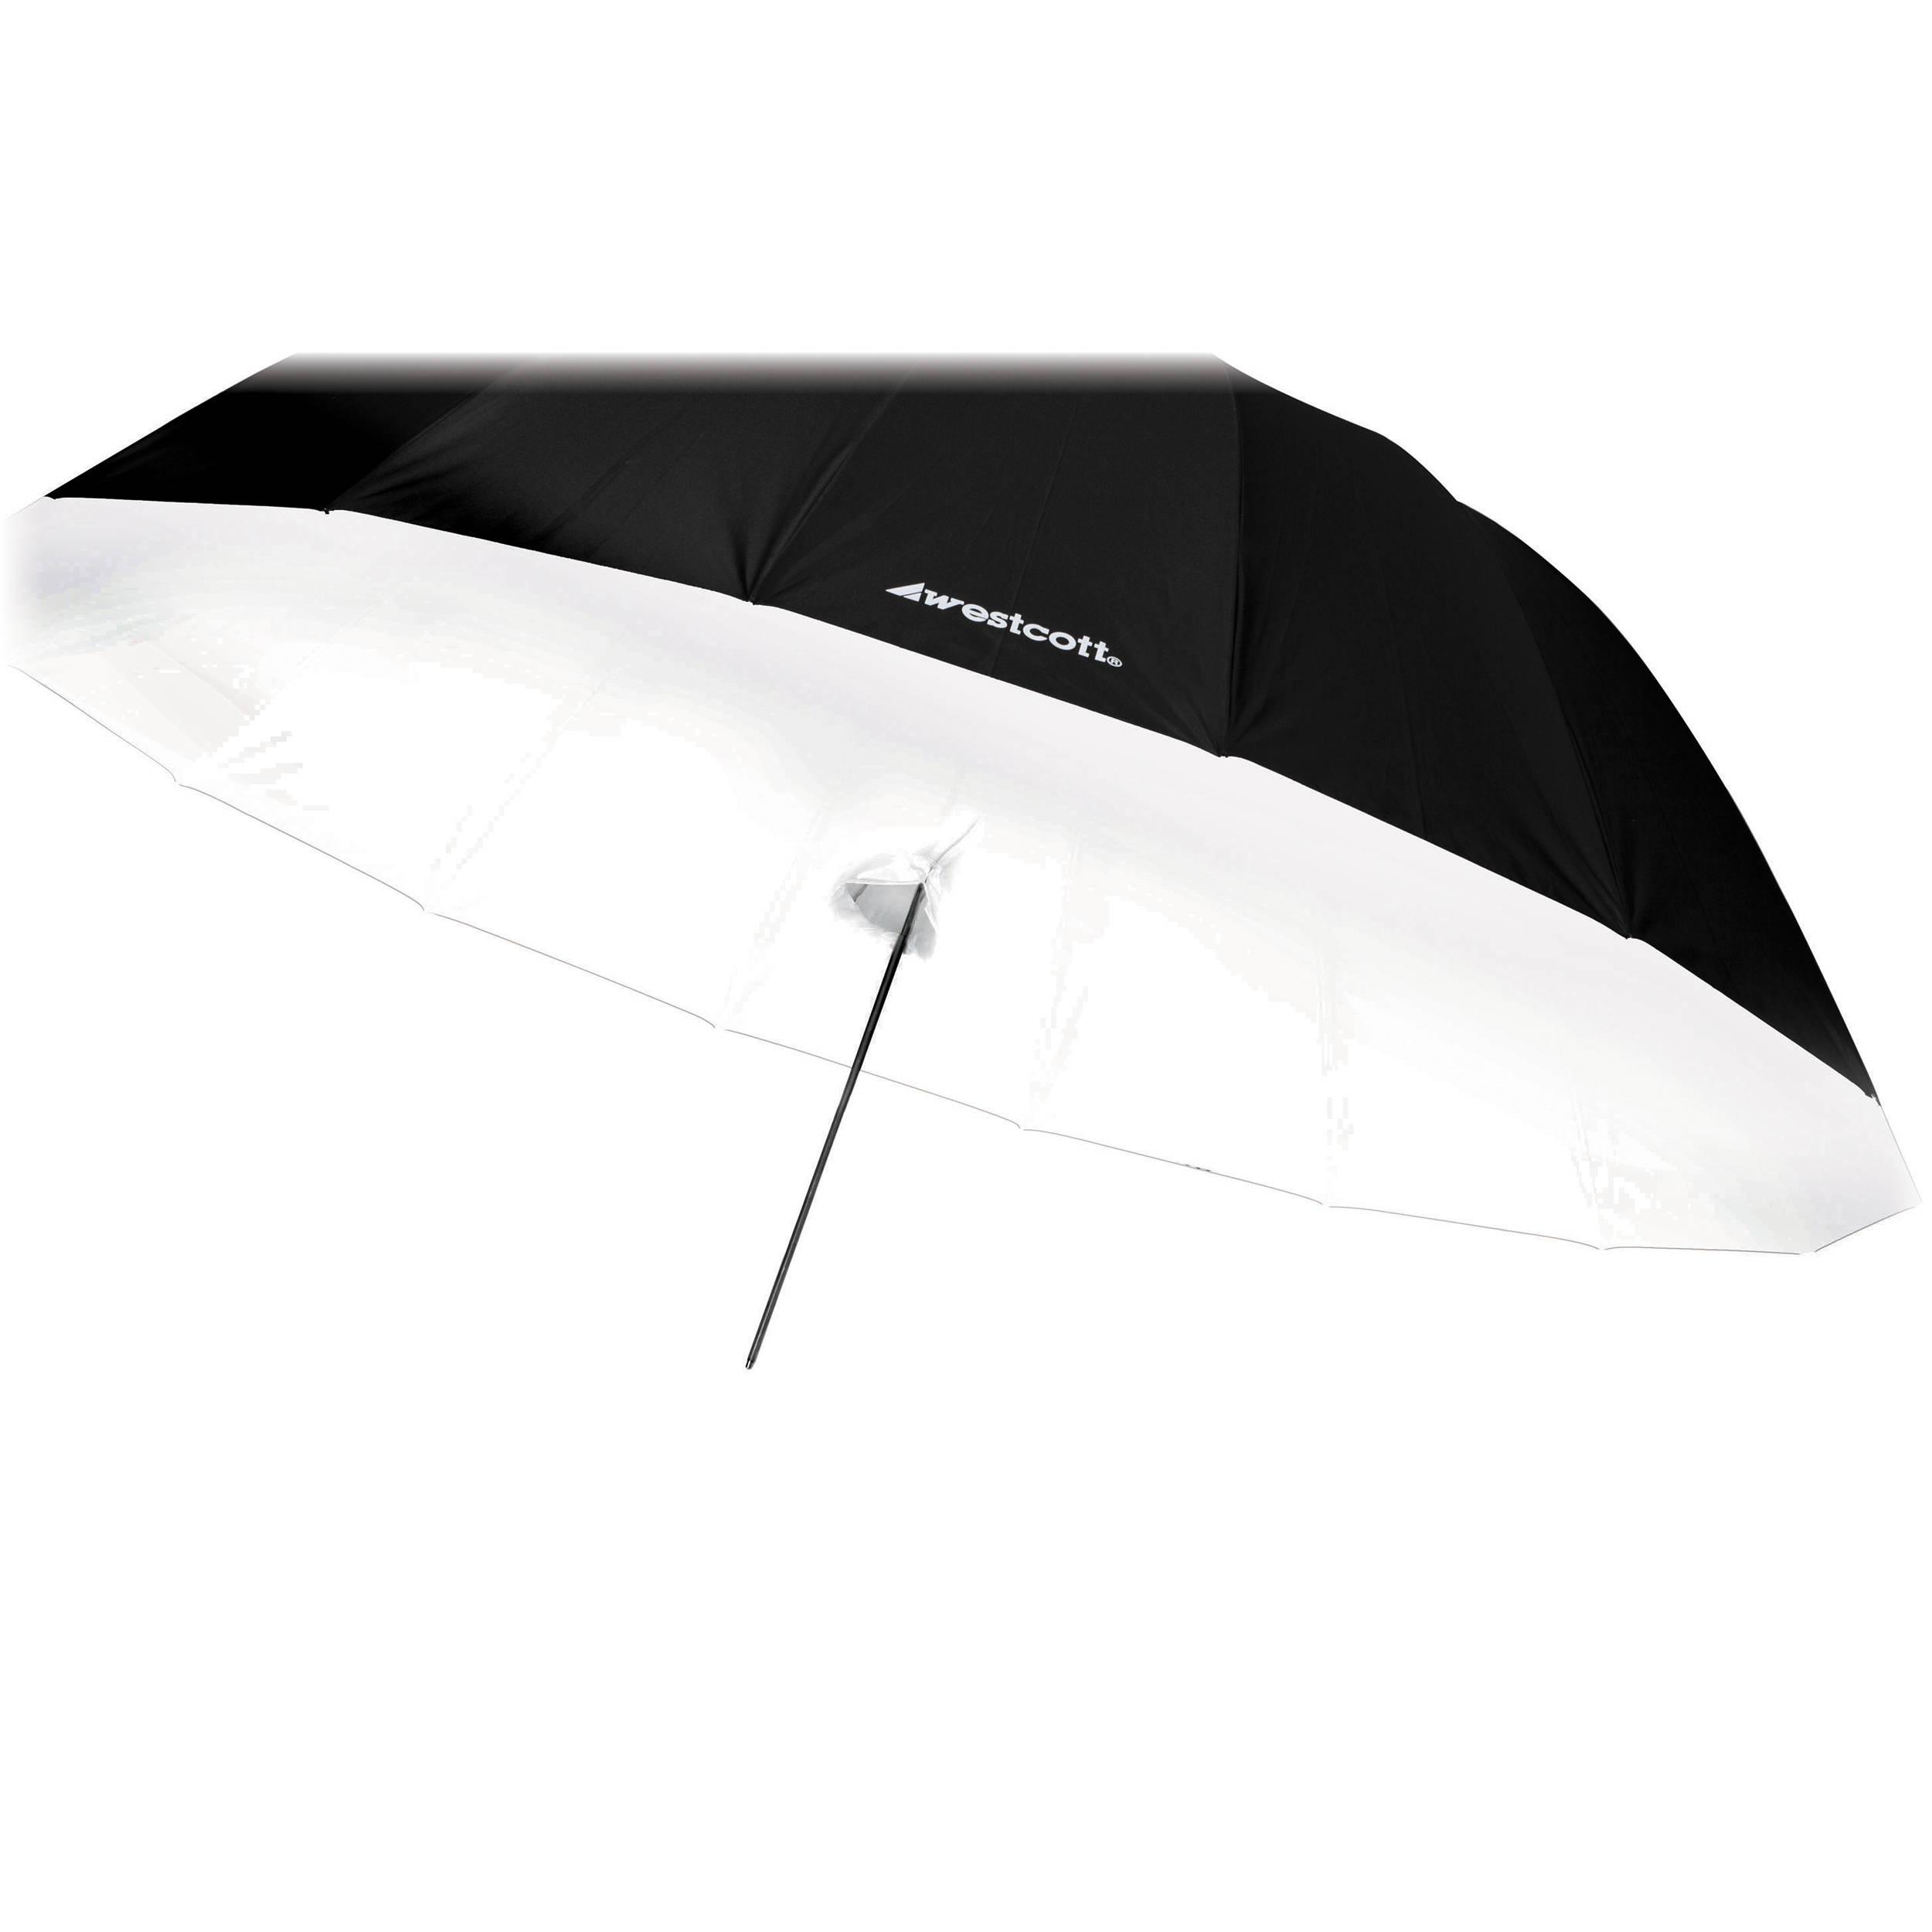 Light Diffuser: Umbrella Light Diffuser